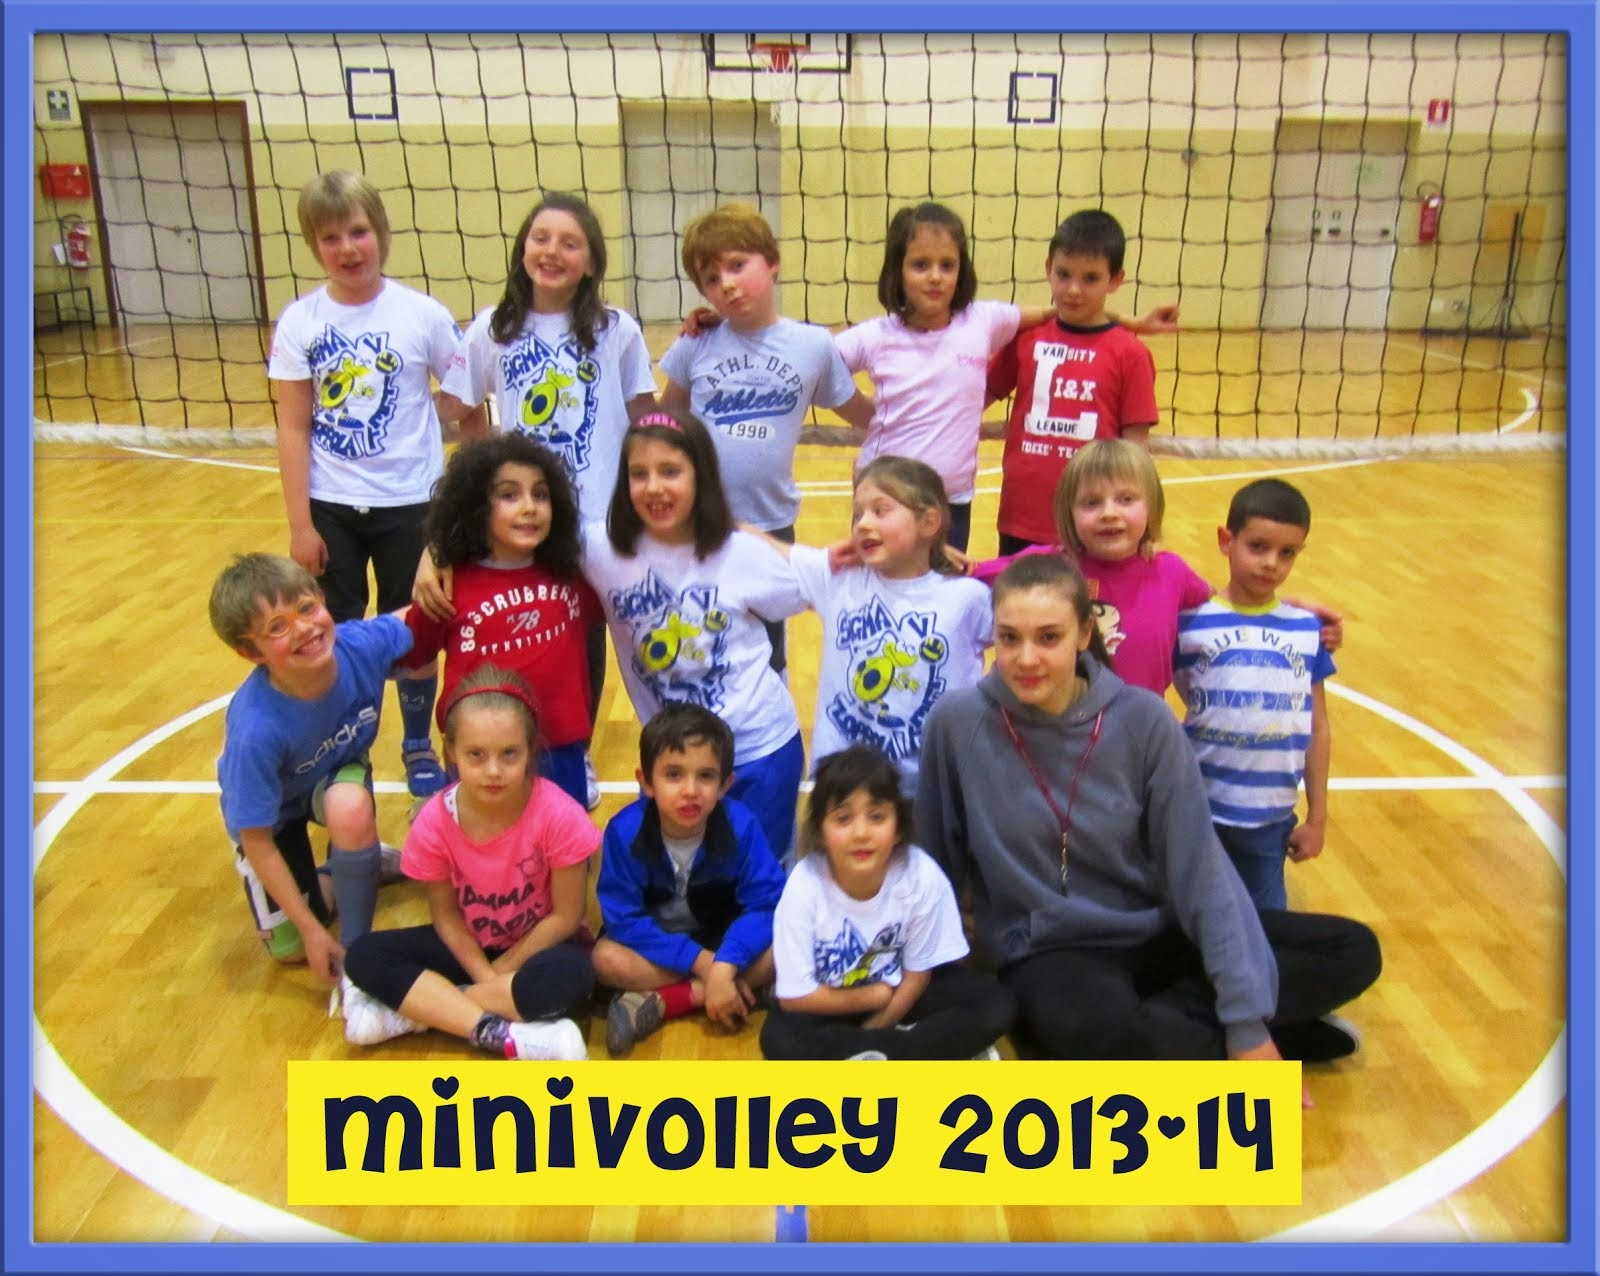 MINIVOLLEY 2013/14